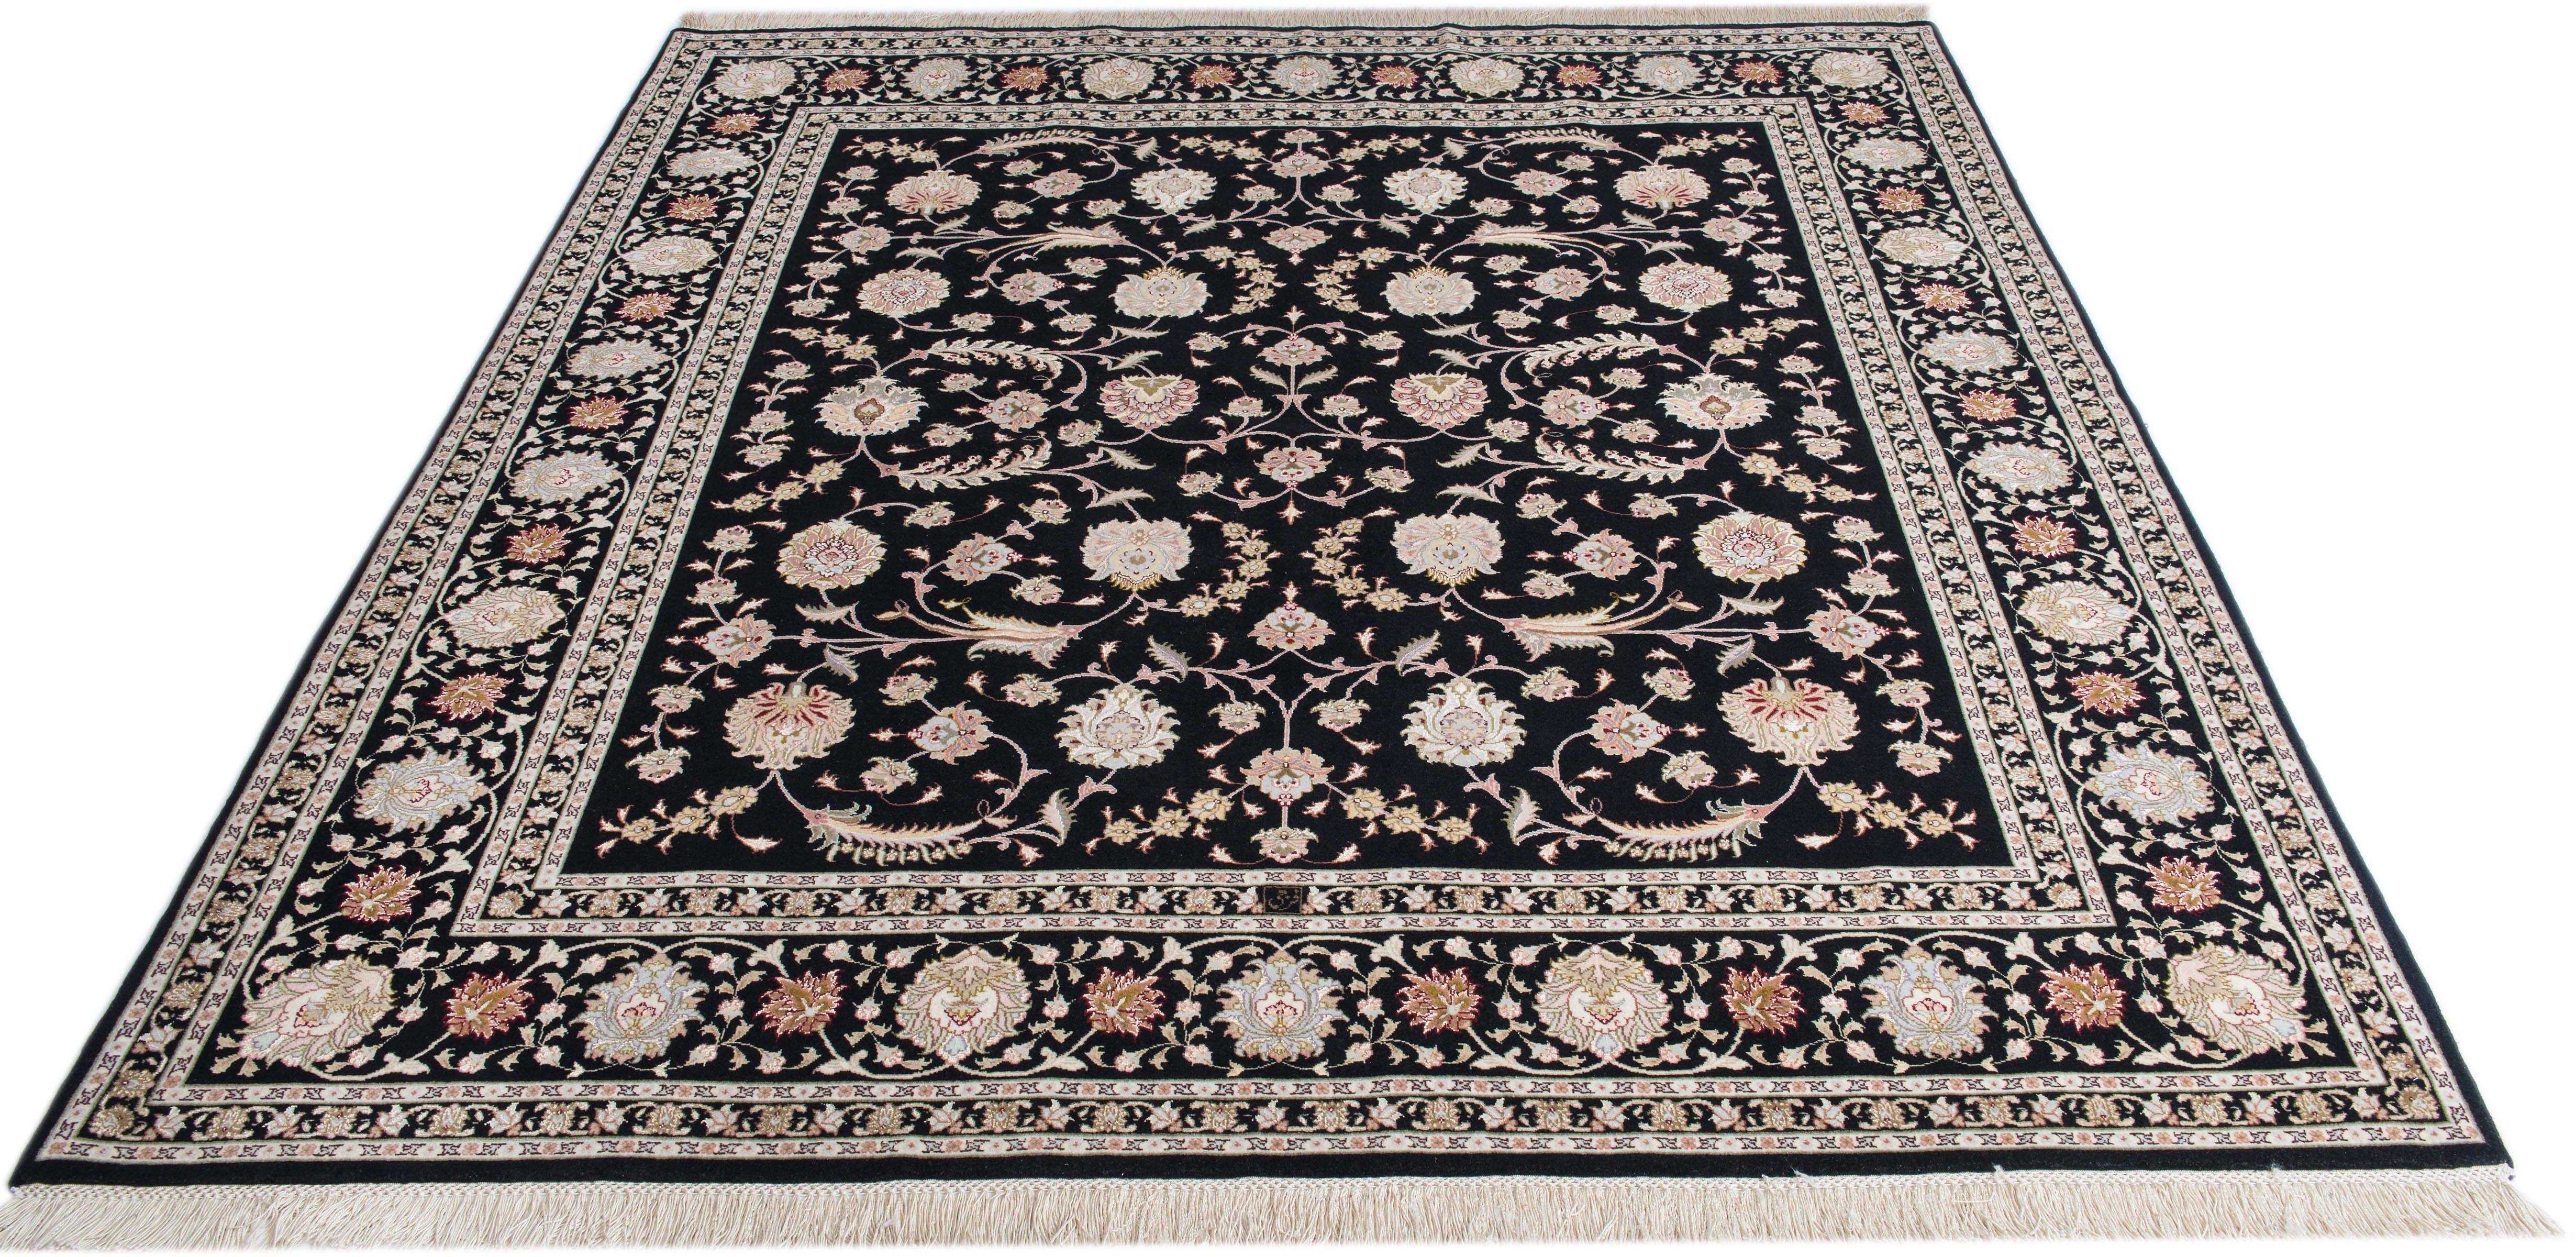 Orient-Teppich, Parwis, »Tabriz Faraji«, handgeknüpft, Wolle, 700.000 Knoten/m², Unikat